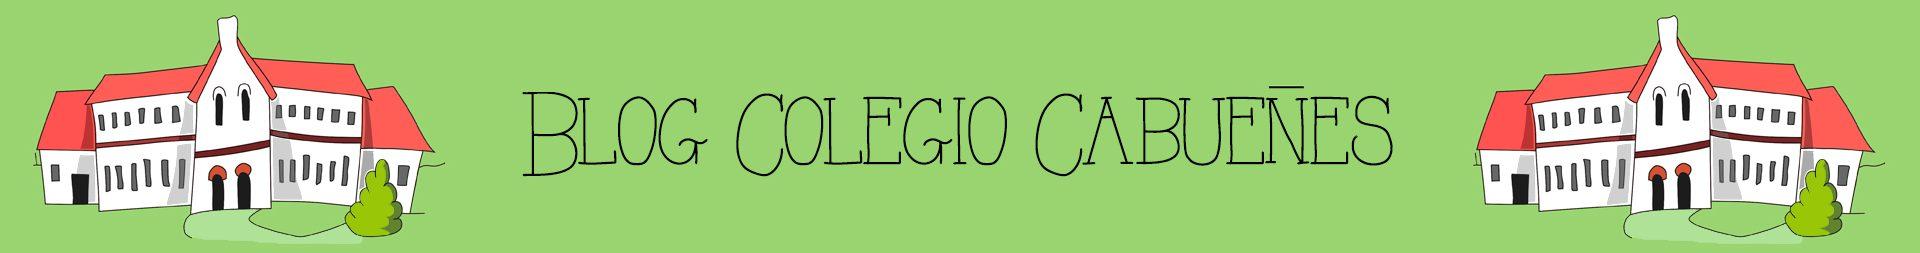 Blog del Colegio Cabueñes